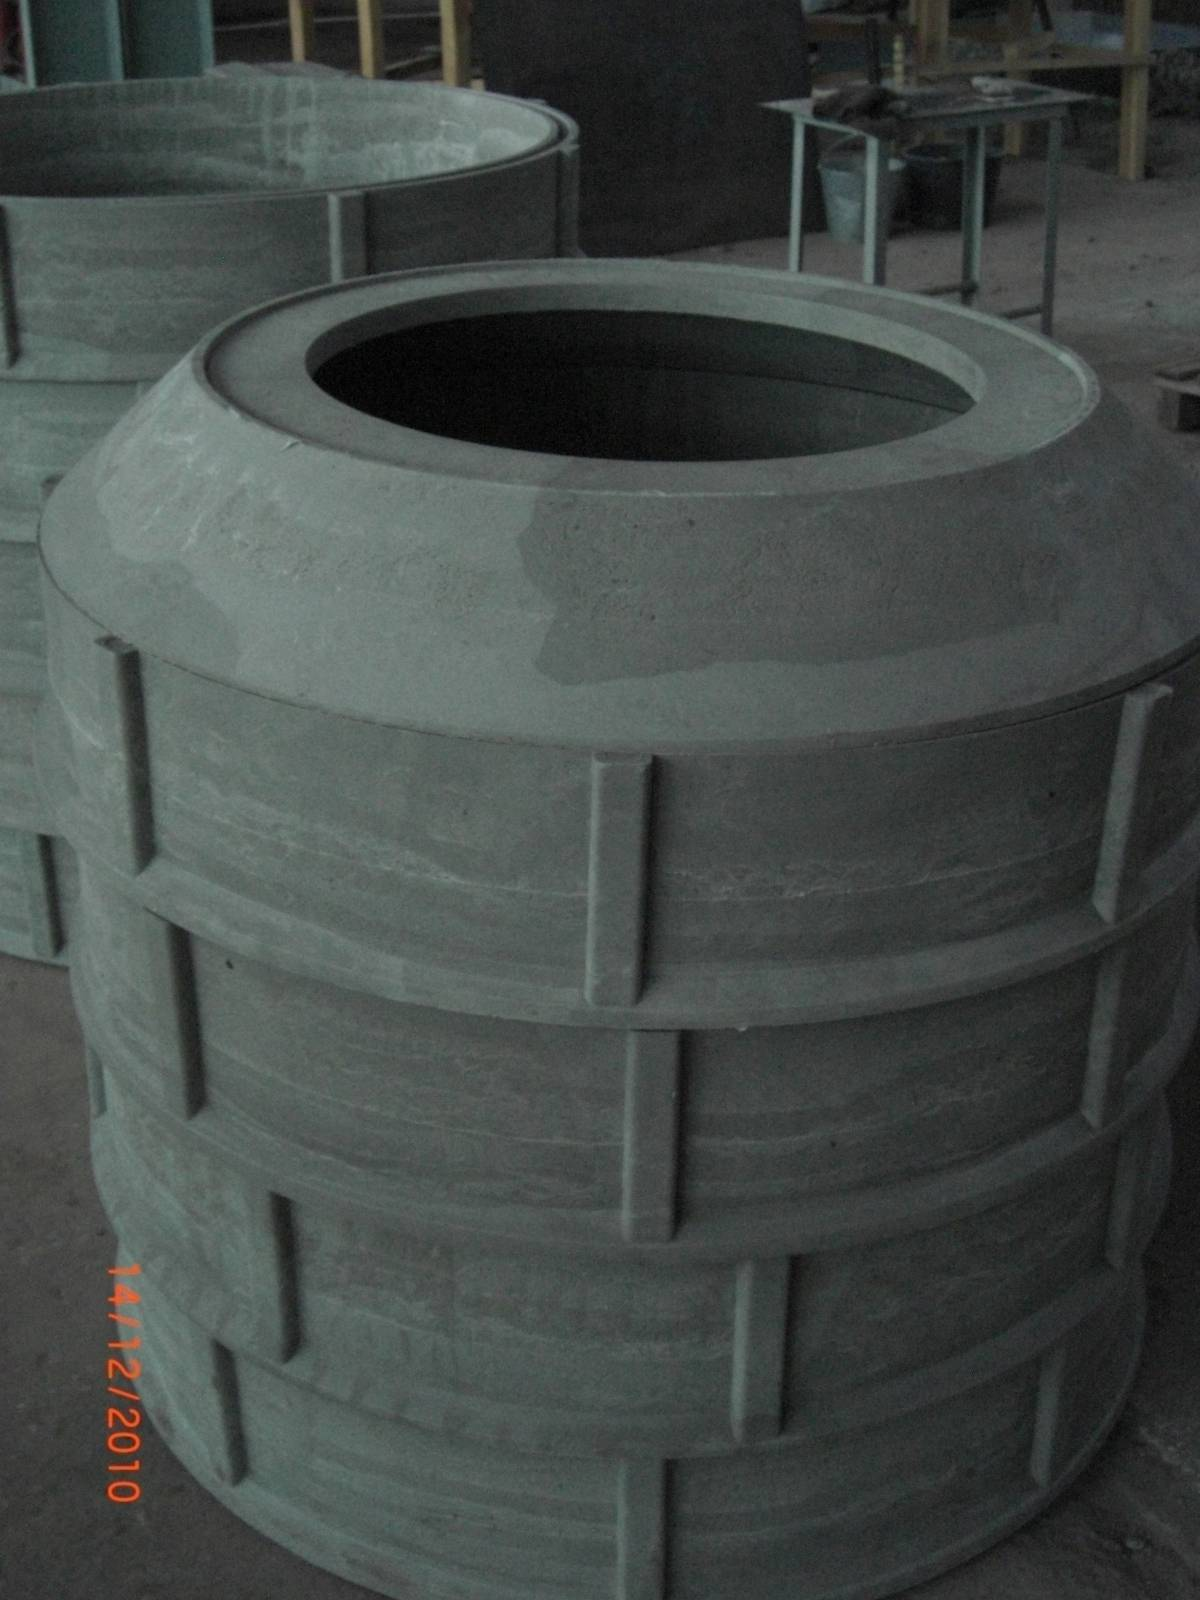 Установка колец в колодец: виды монтажа конструкций